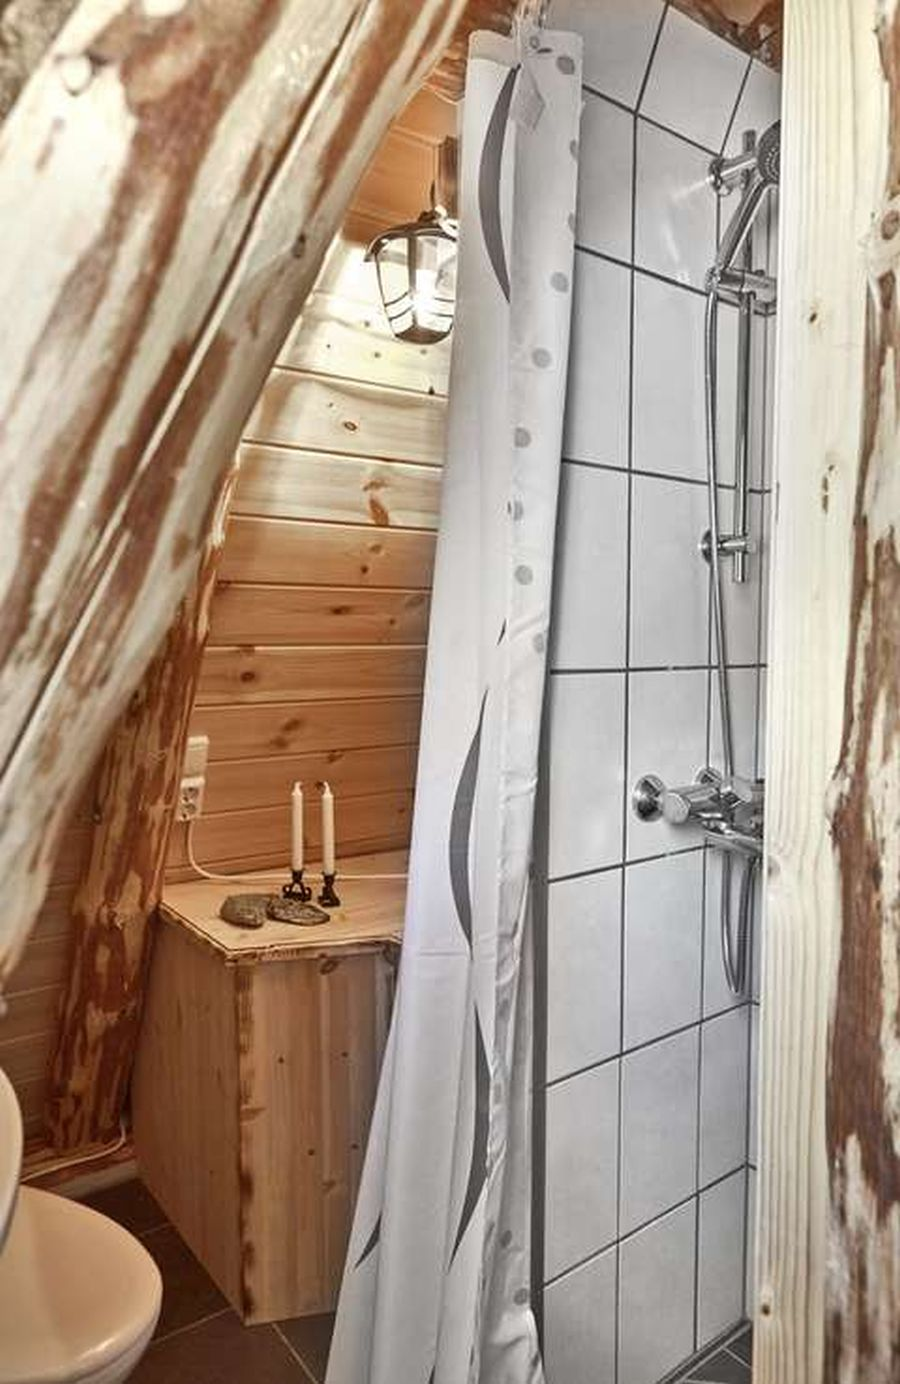 adelaparvu-com-despre-cabana-hobbit-hobbithytta-norvegia-design-sverre-mork-foto-sveinung-brathen-10